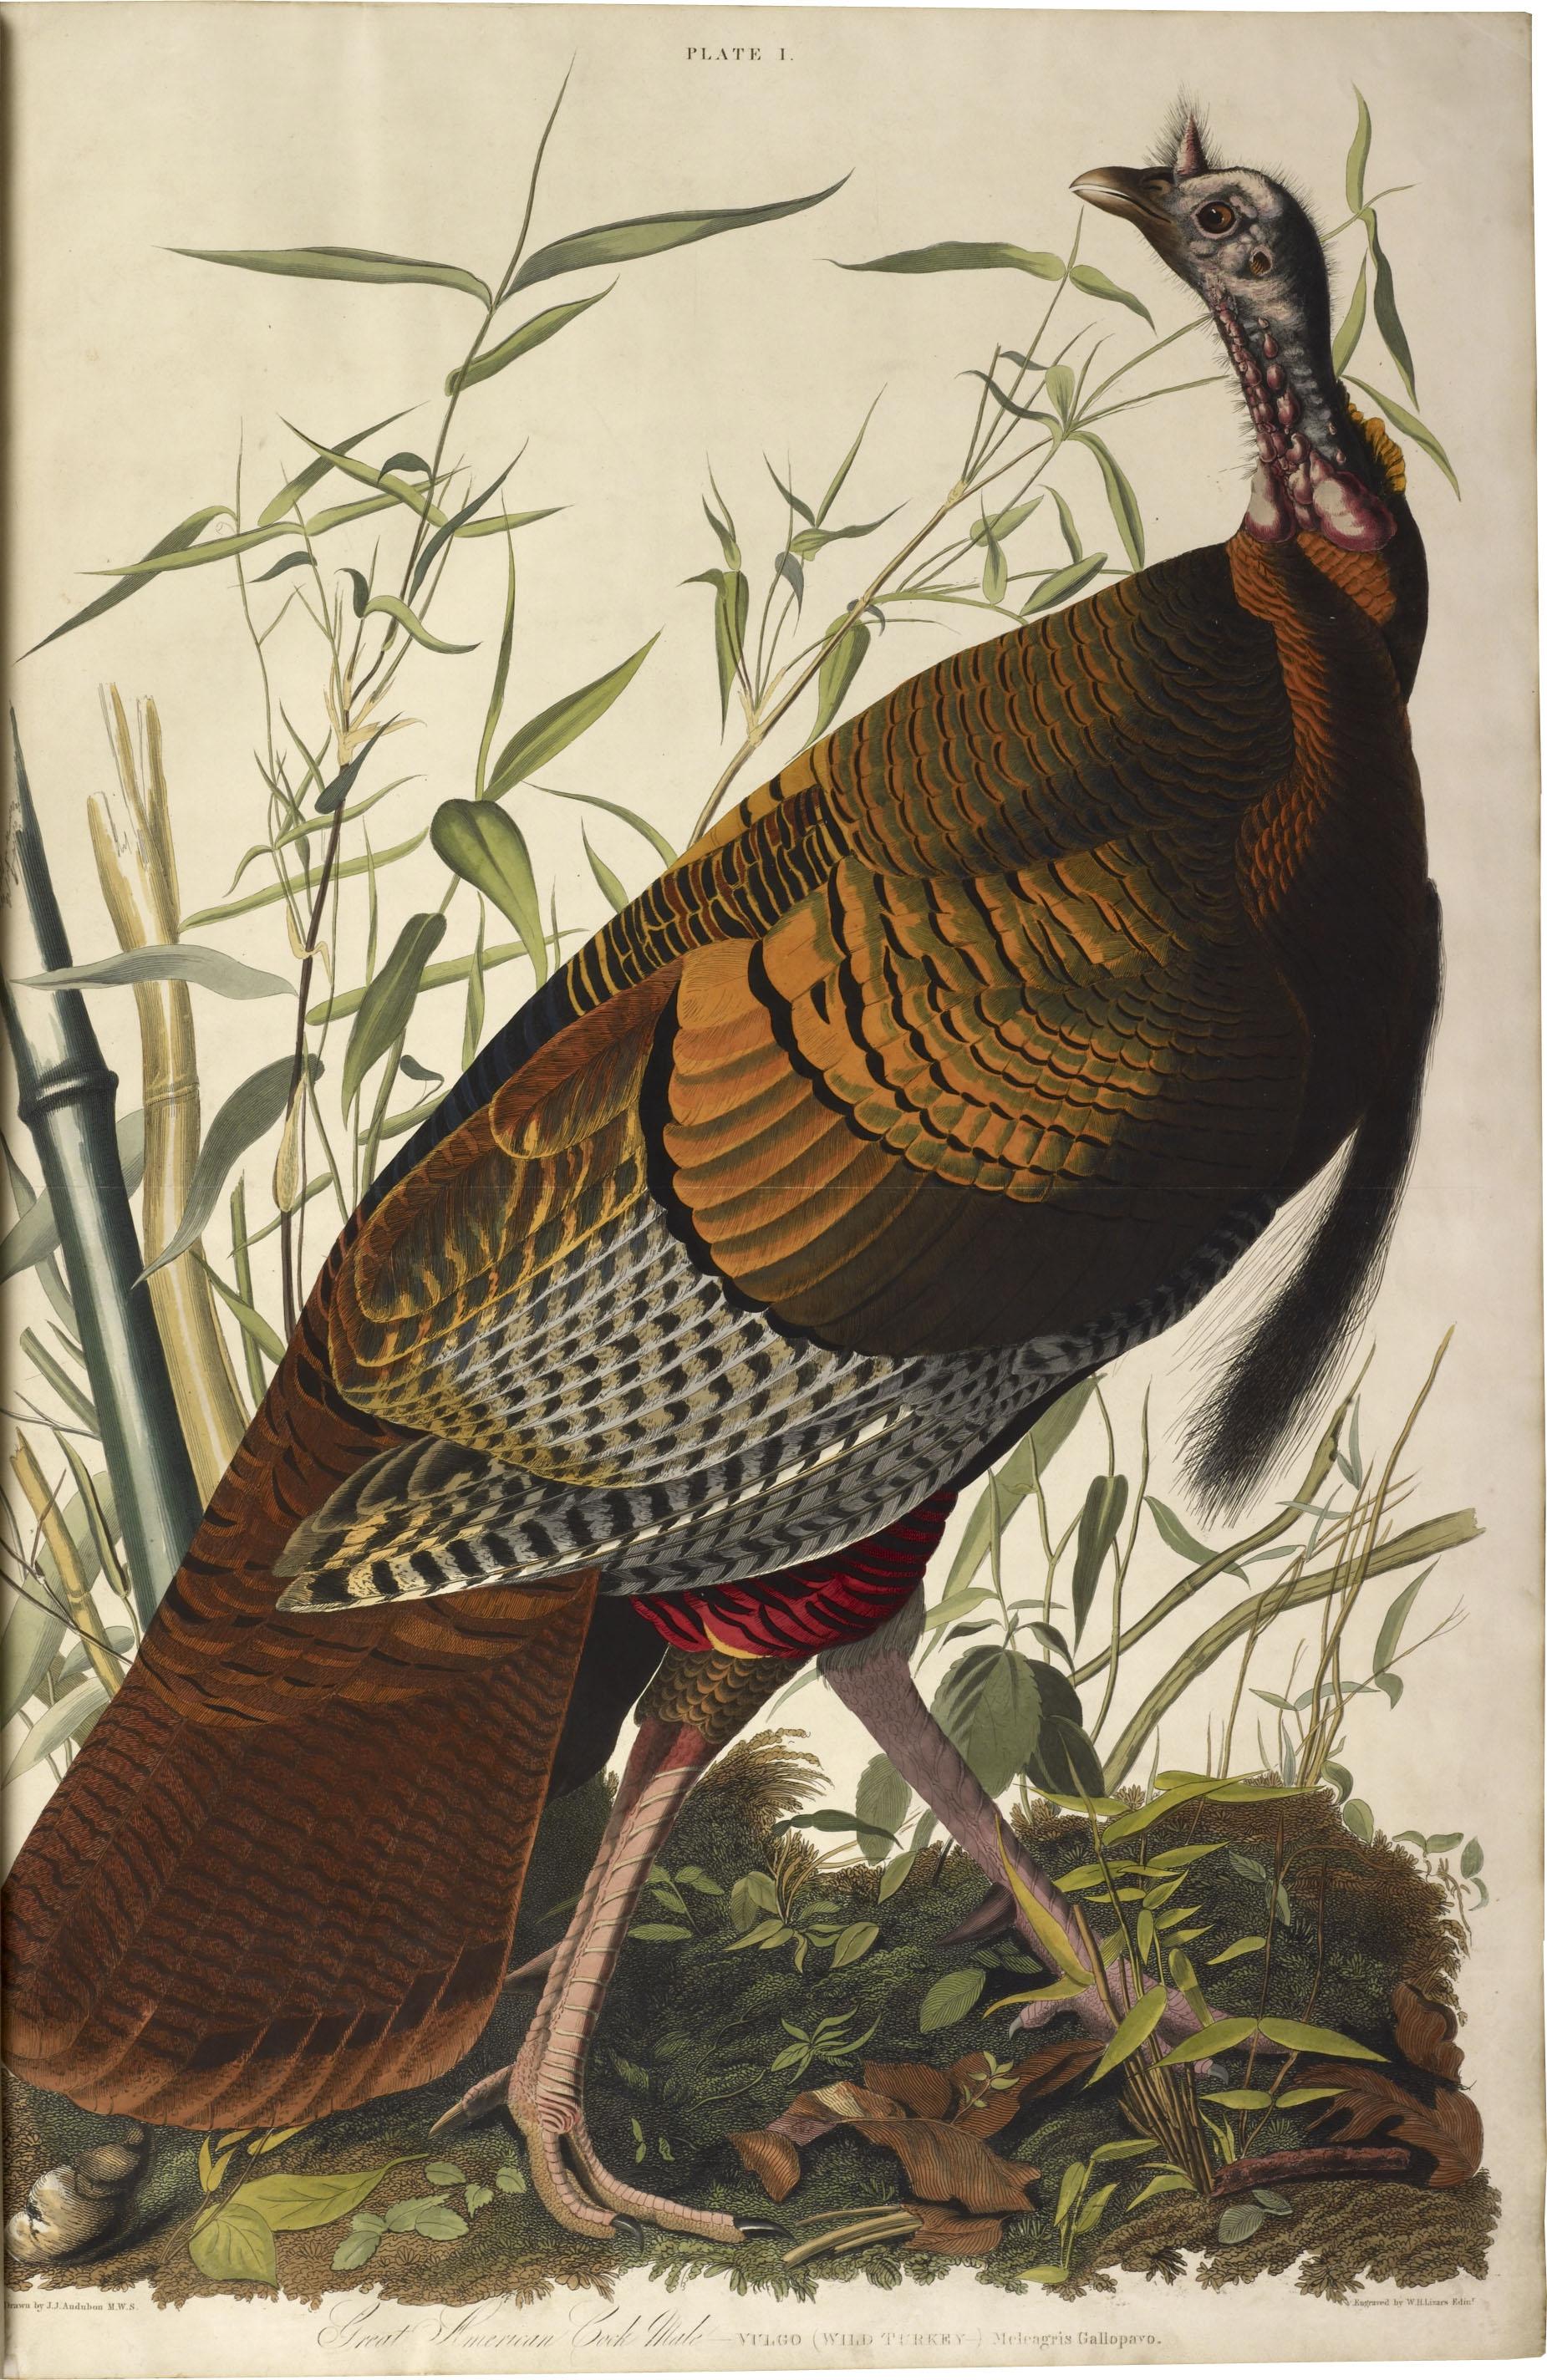 Audubon's Birds of America showing a wild turkey, plate 1